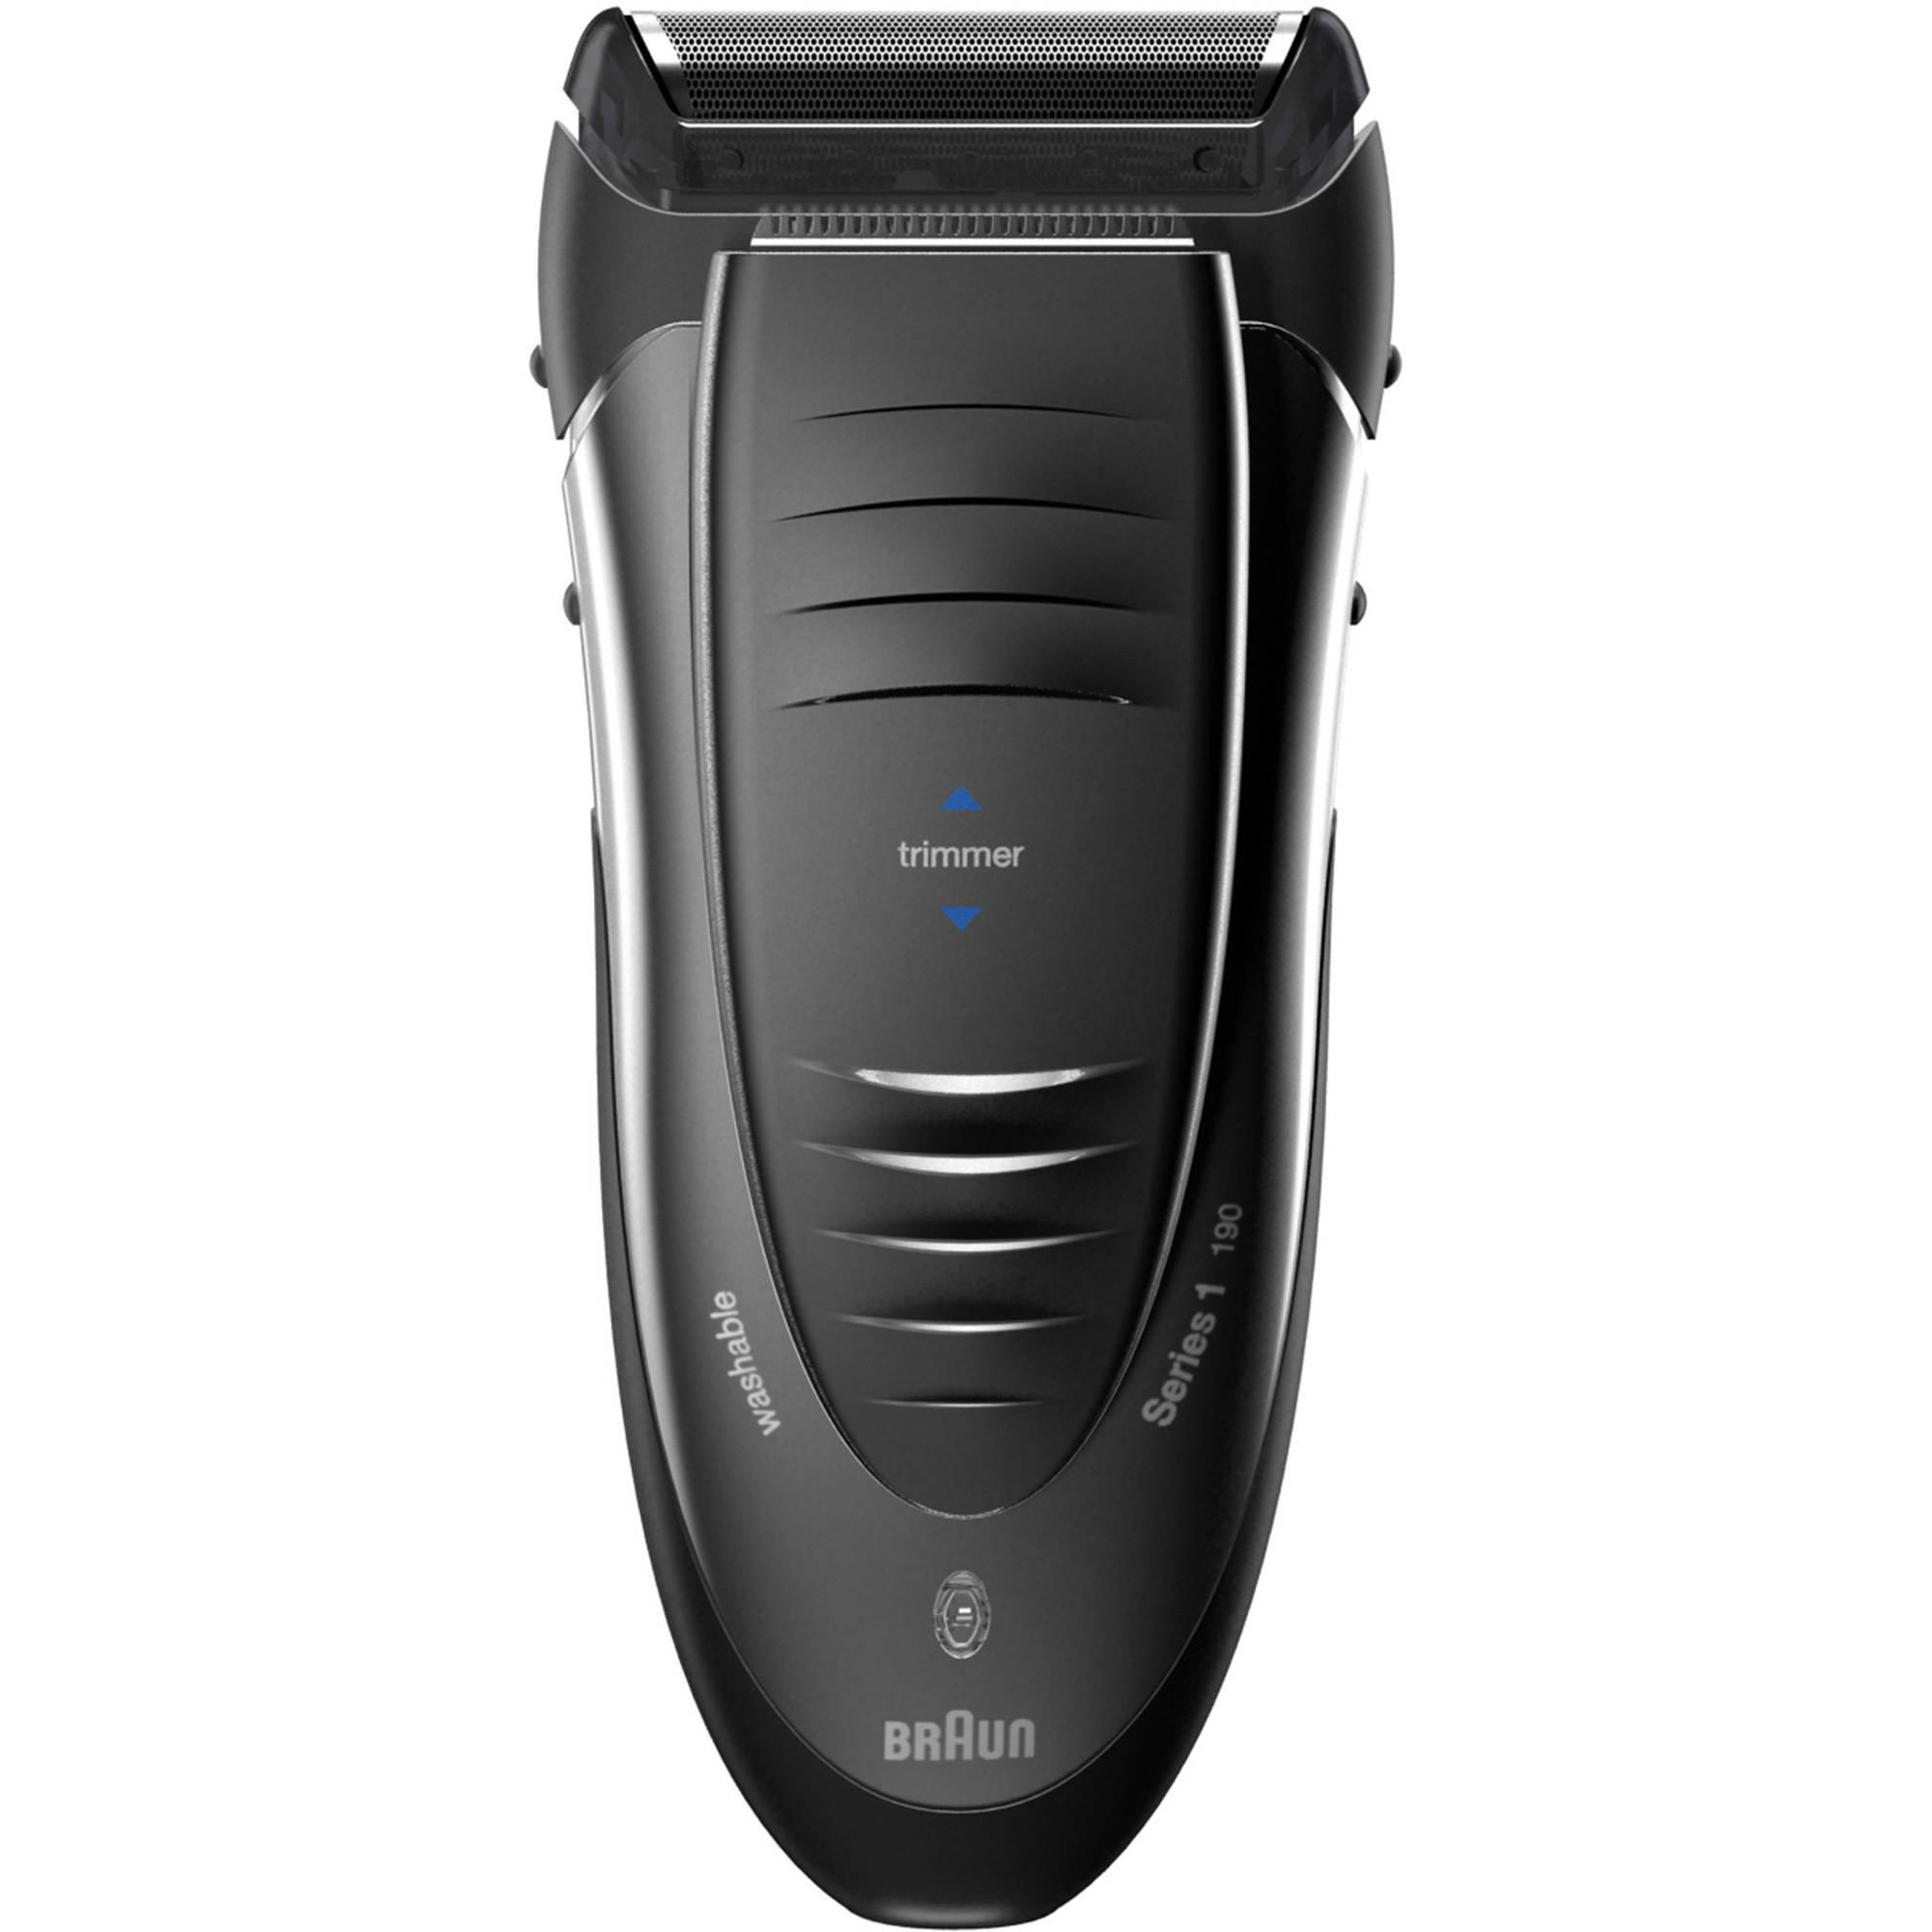 Máquina De Afeitar Braun afeitadora de Smart Control 190 + Braun en Veo y Compro